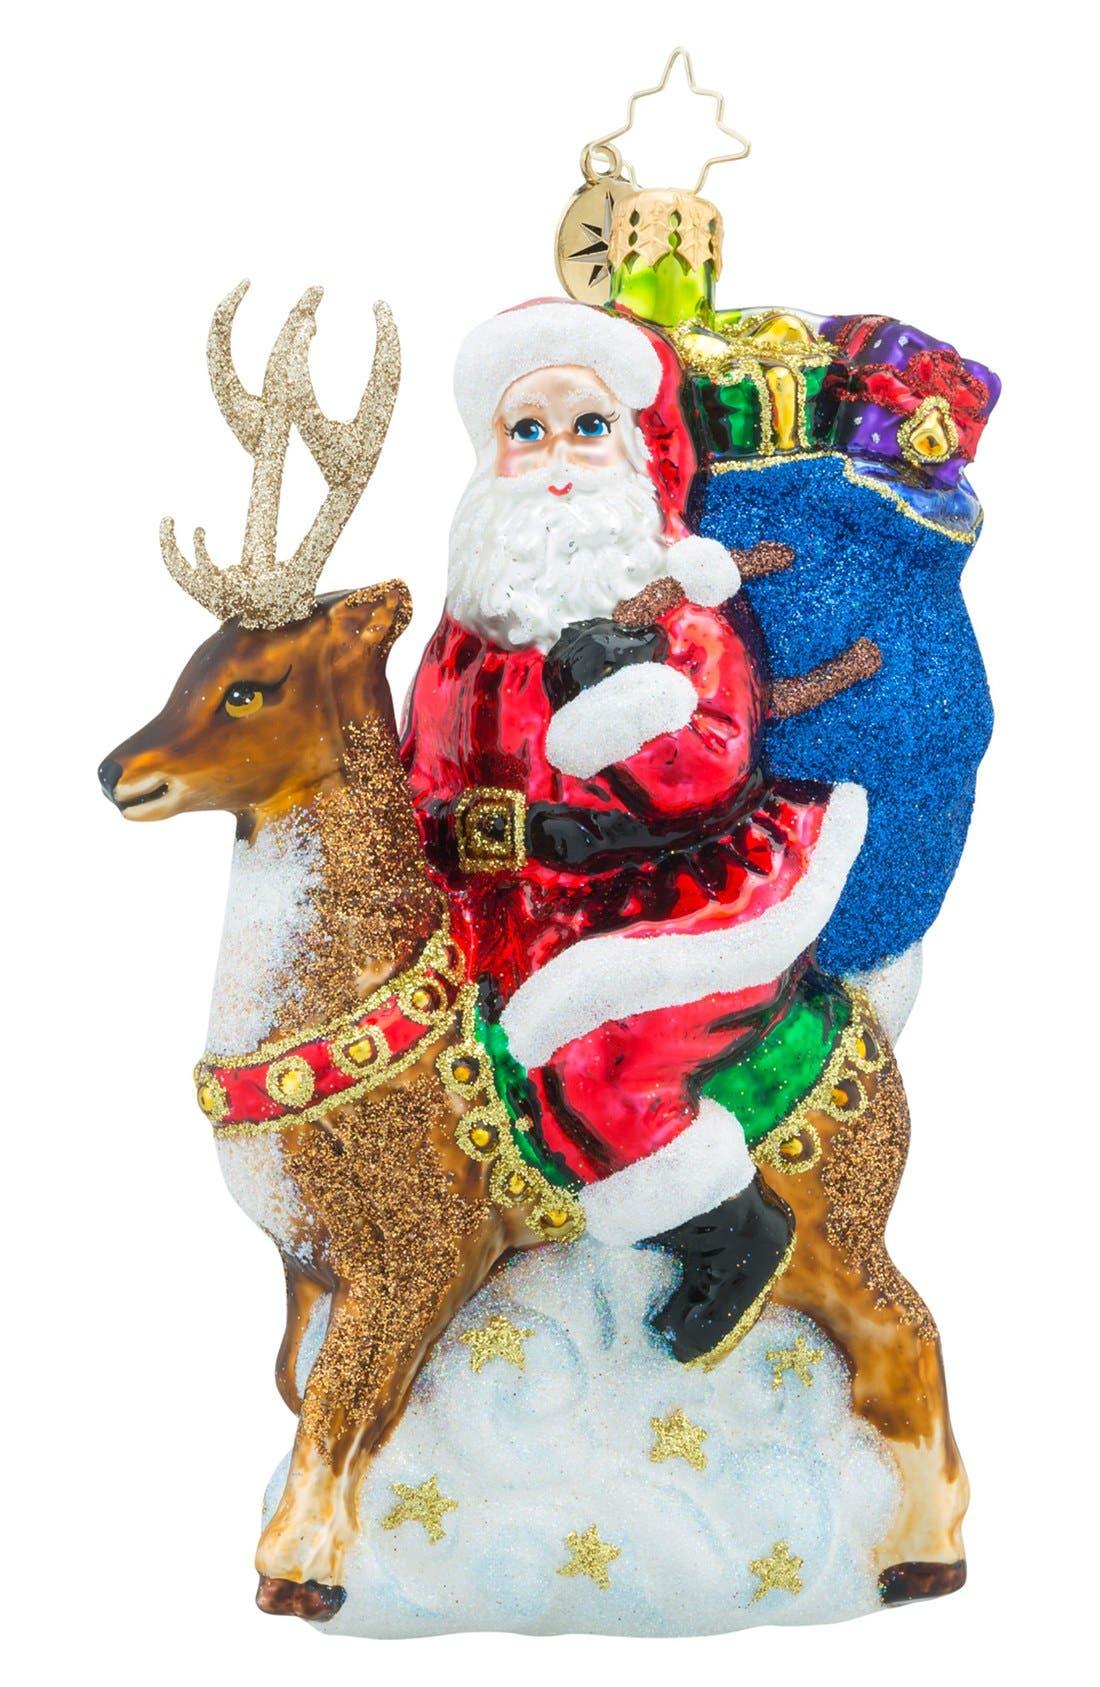 'Love My Ride' Santa & Reindeer Ornament,                         Main,                         color, Red/ Multi